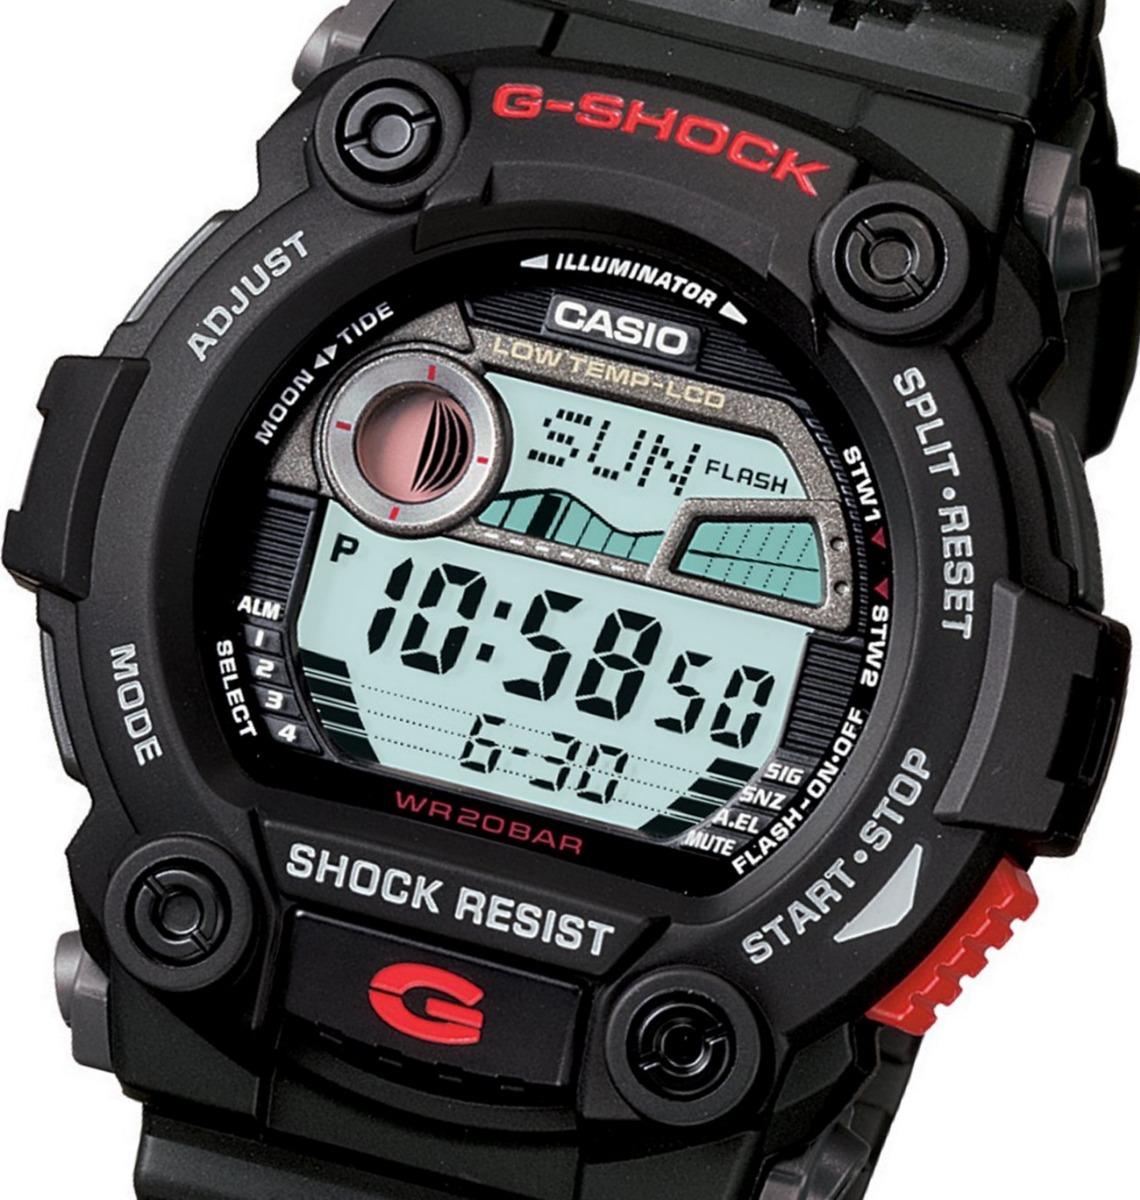 Reloj Hombre Casio Cod: W 217hm 9a Joyeria Esponda